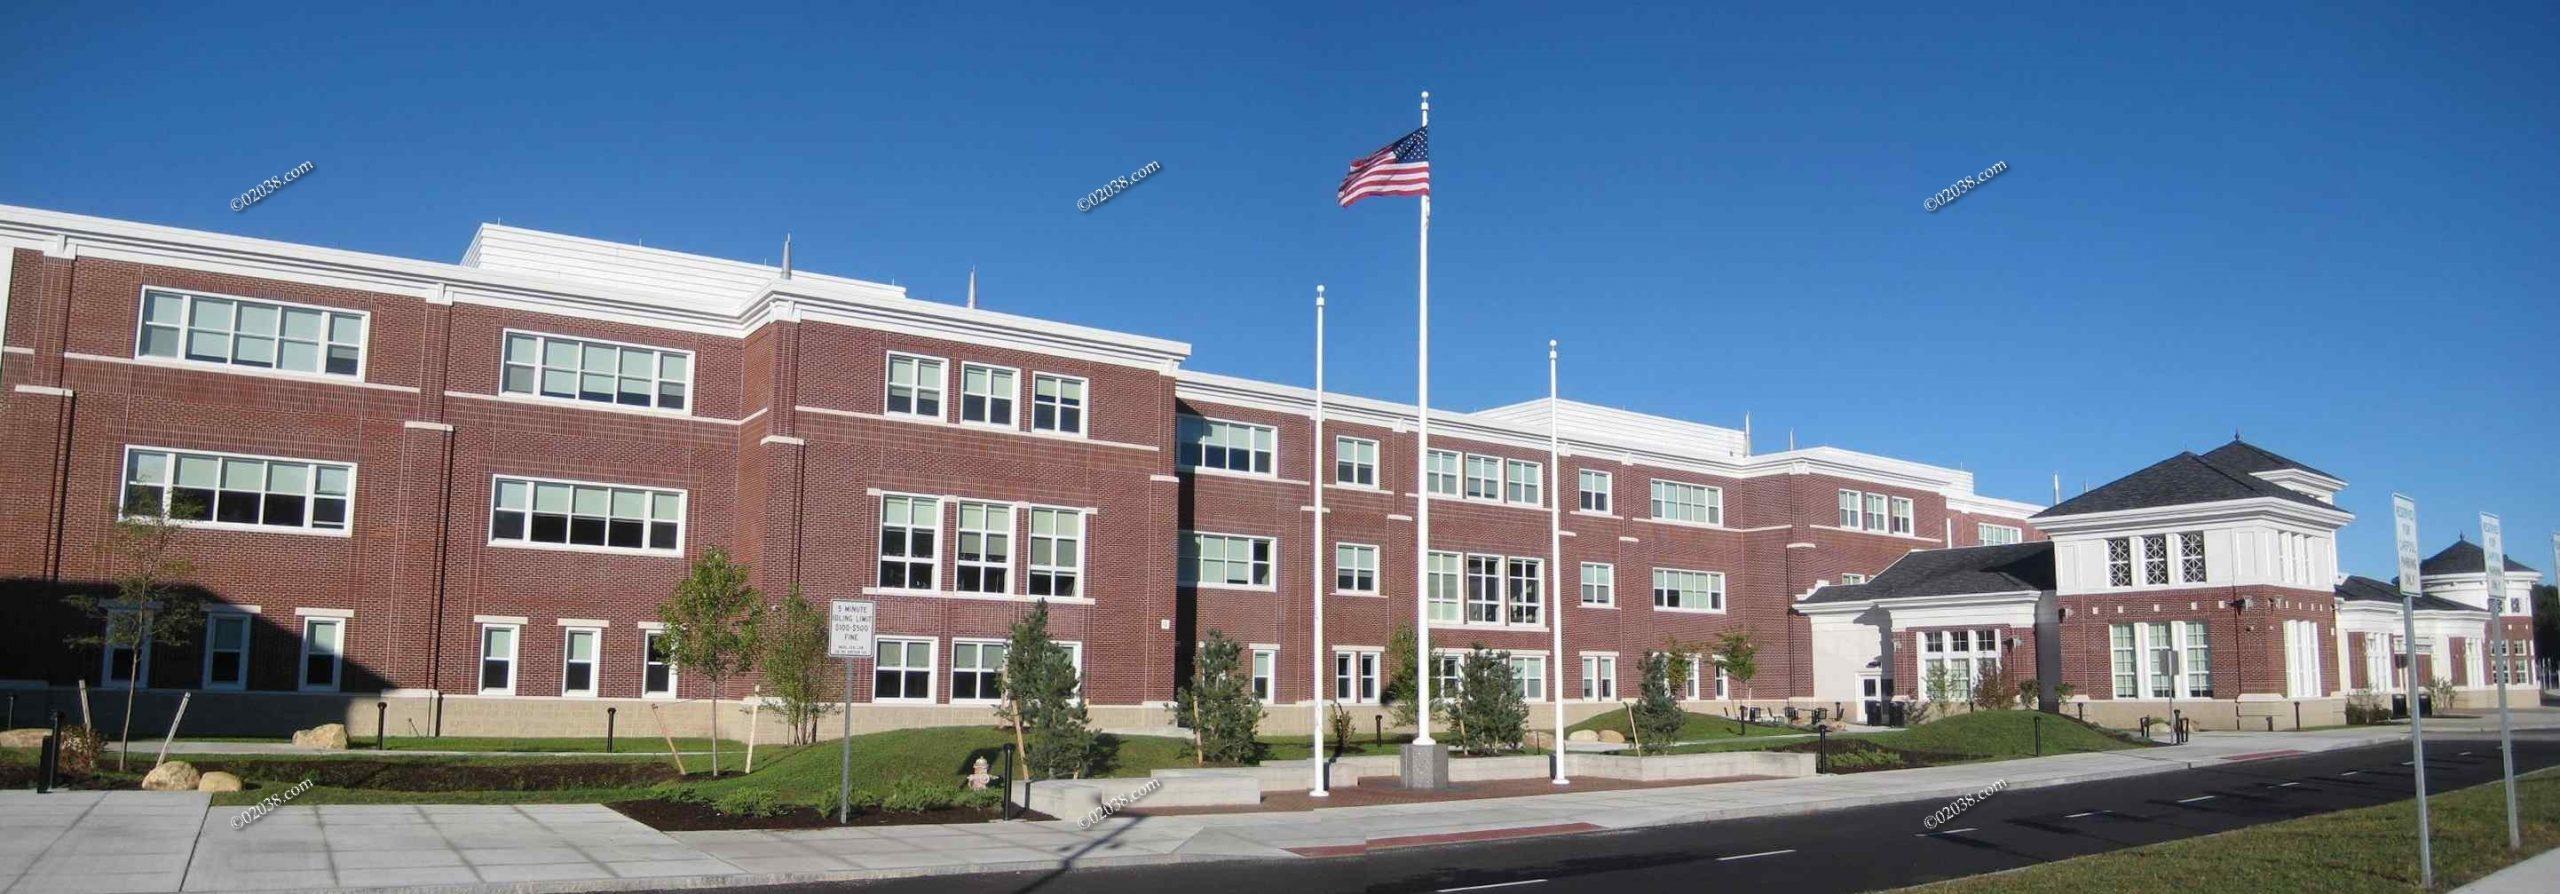 Exterior Franklin High School Franklin MA